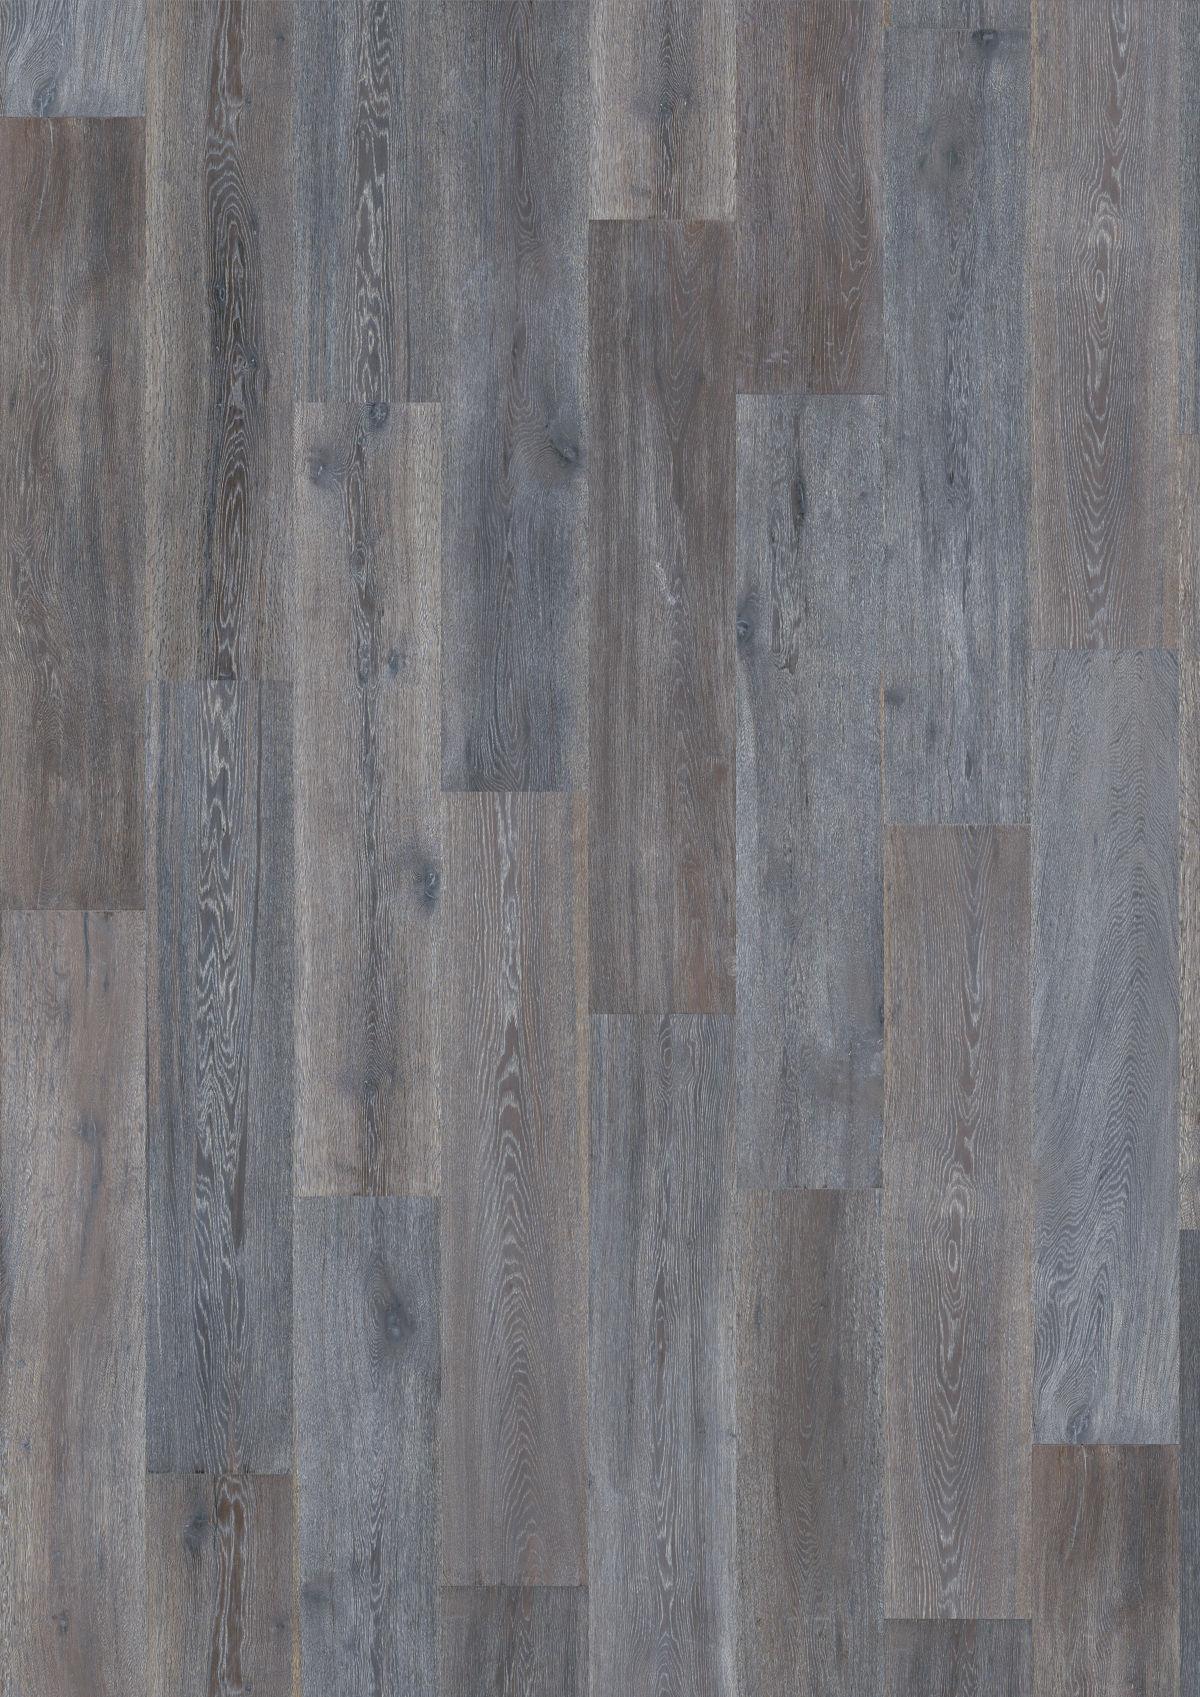 kahrs oak maison engineered wood flooring. Black Bedroom Furniture Sets. Home Design Ideas